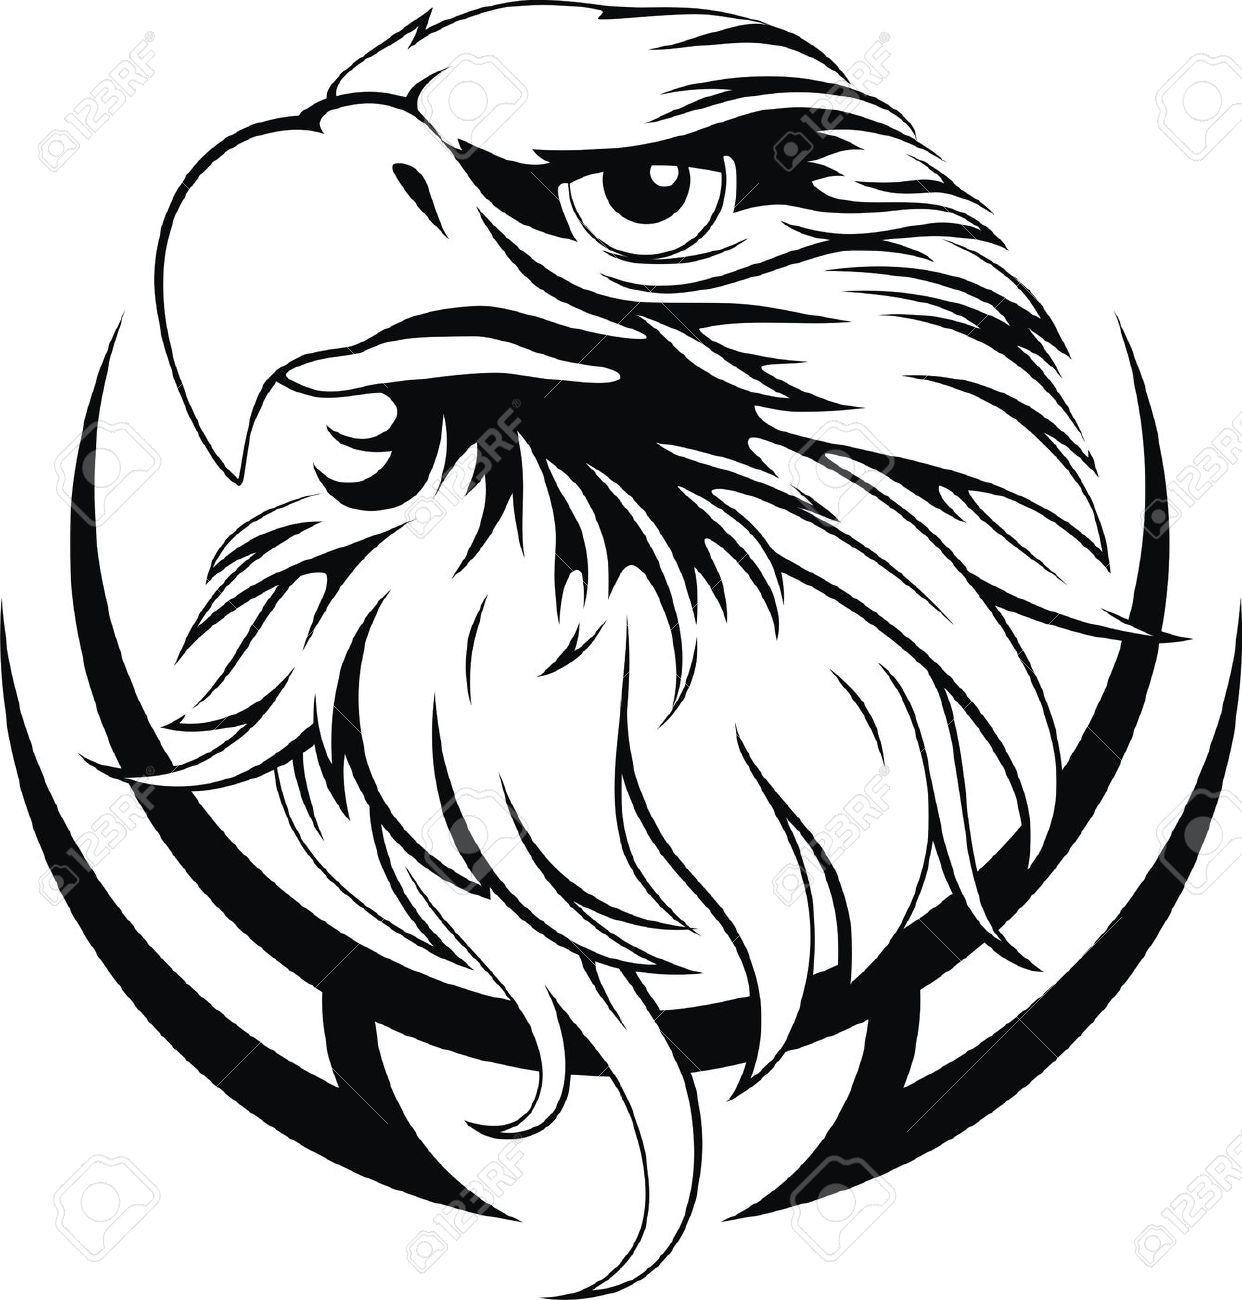 Black Hawk Cliparts, Stock Vector And Royalty Free Black